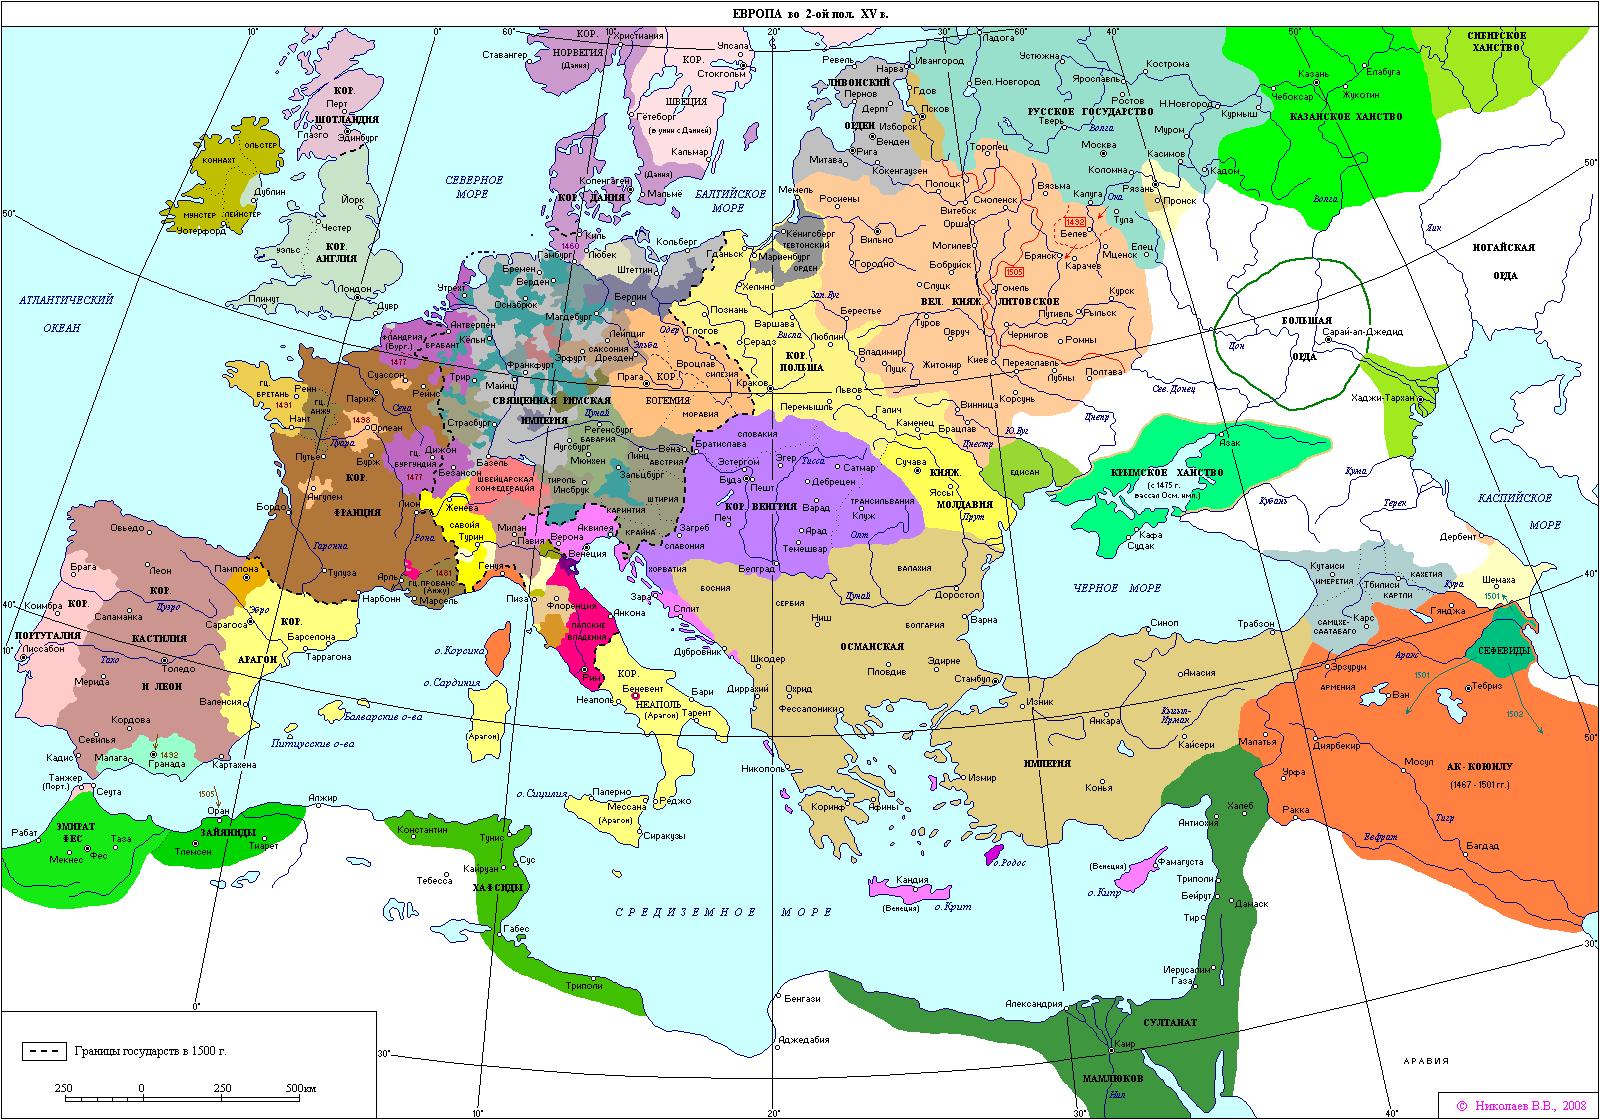 038-europe1450-1500